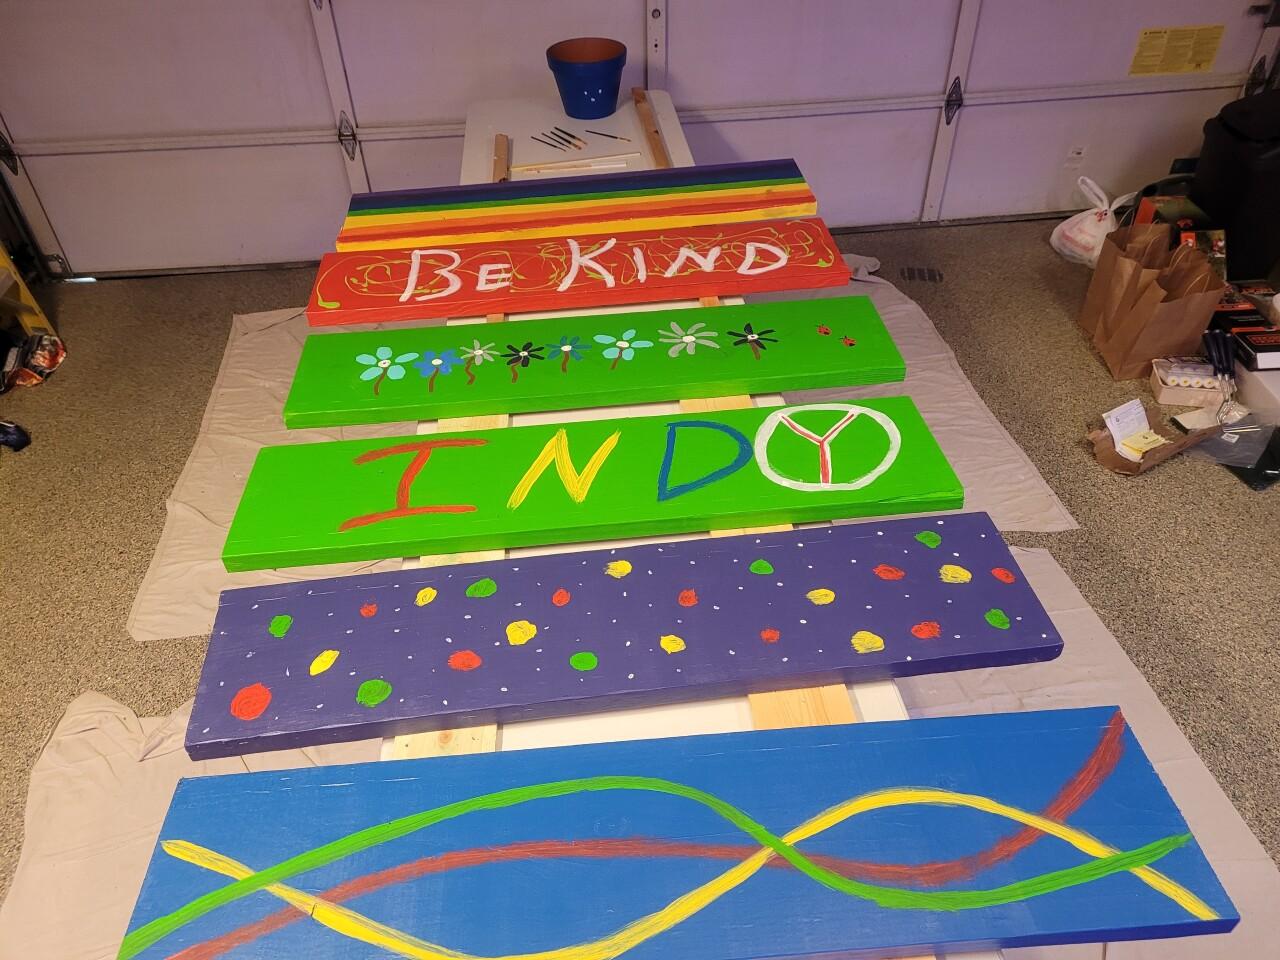 BoA employee - Chanda Weston family raised bed boards painted.jpeg